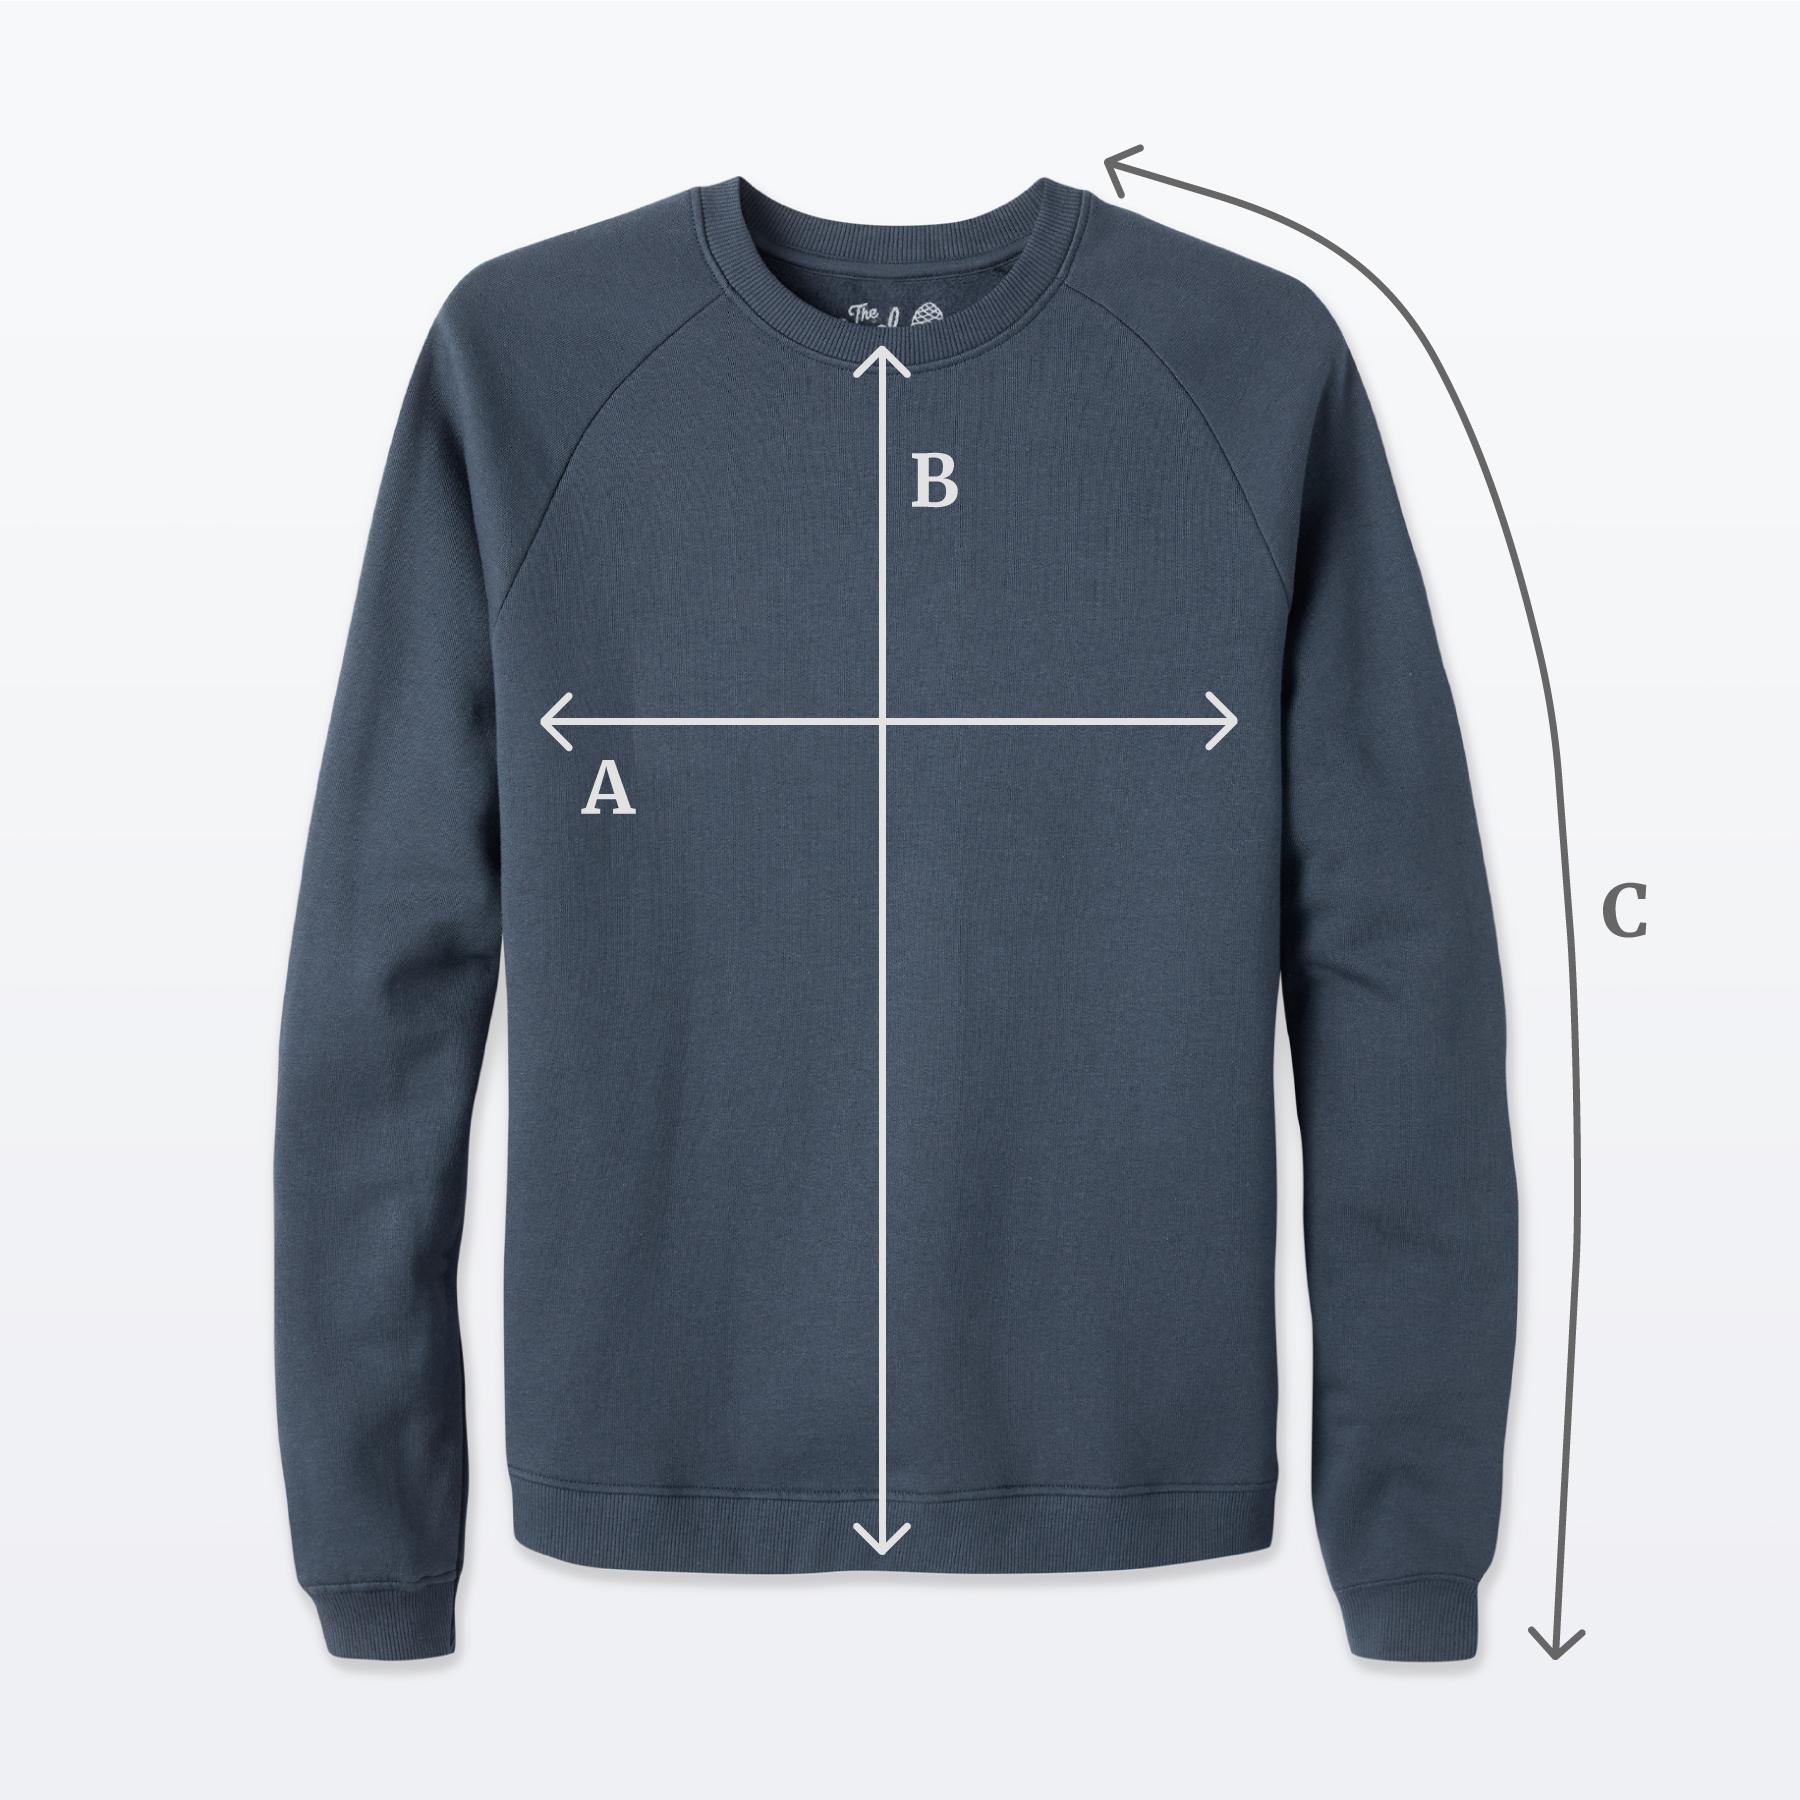 Sizing-organic-t-shirt-dimensions.jpg